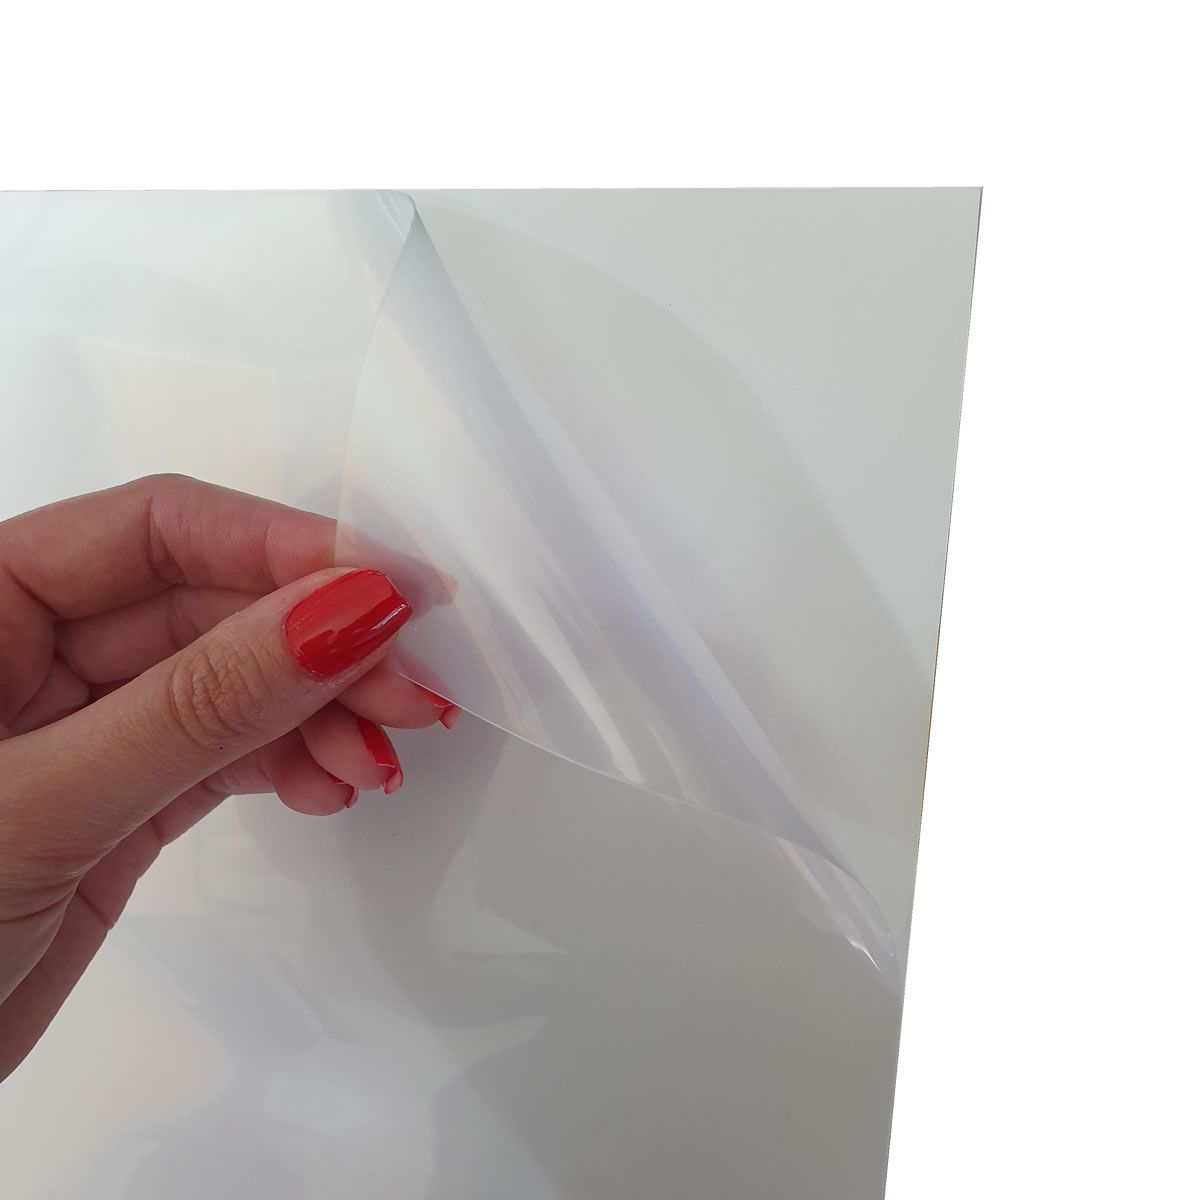 Papel Adesivo vinil transparente 115gr para Impressora Laser Printer 20 folhas A4 Chinamate